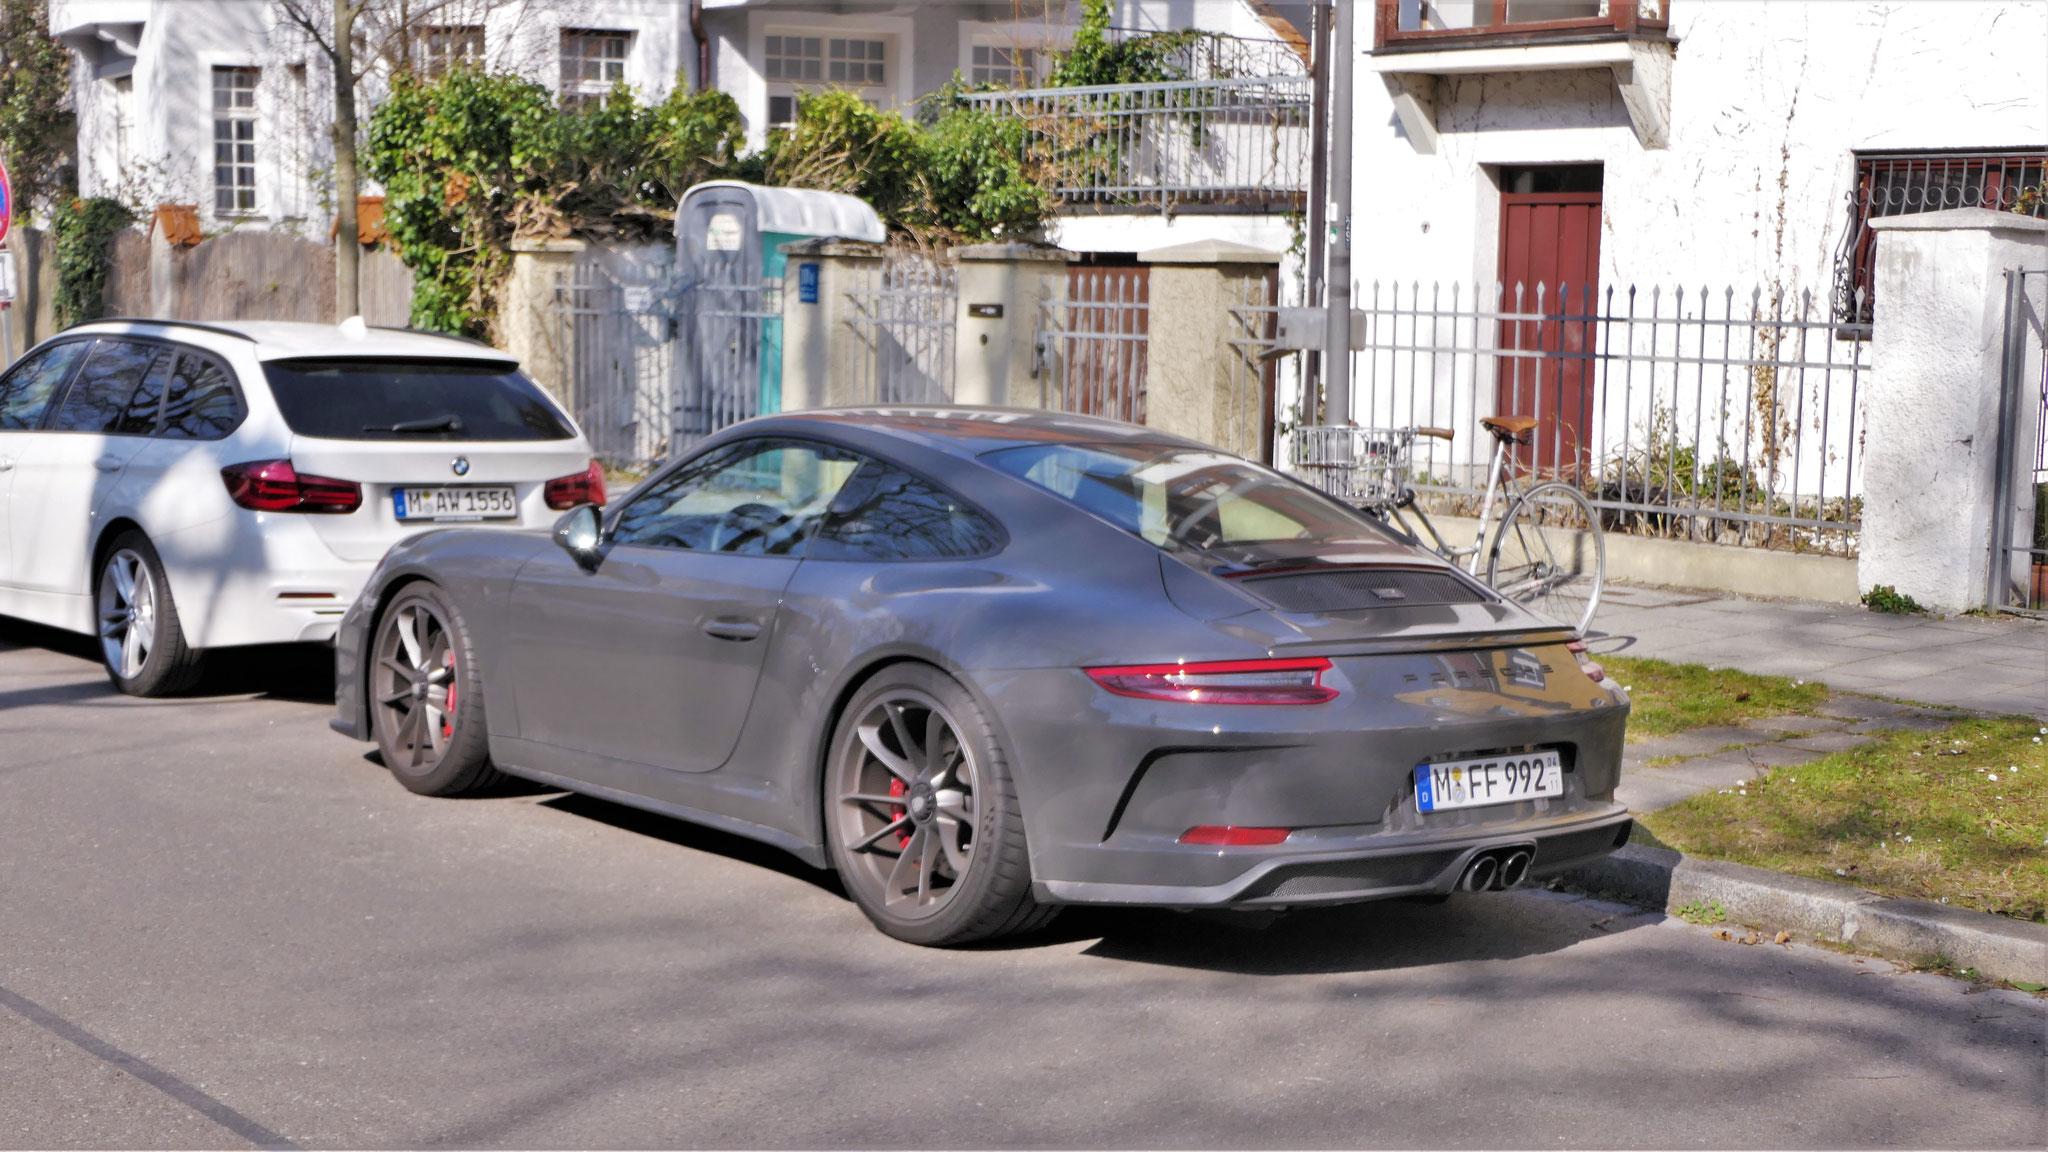 Porsche 991 GT3 Touring Package - M-FF-992